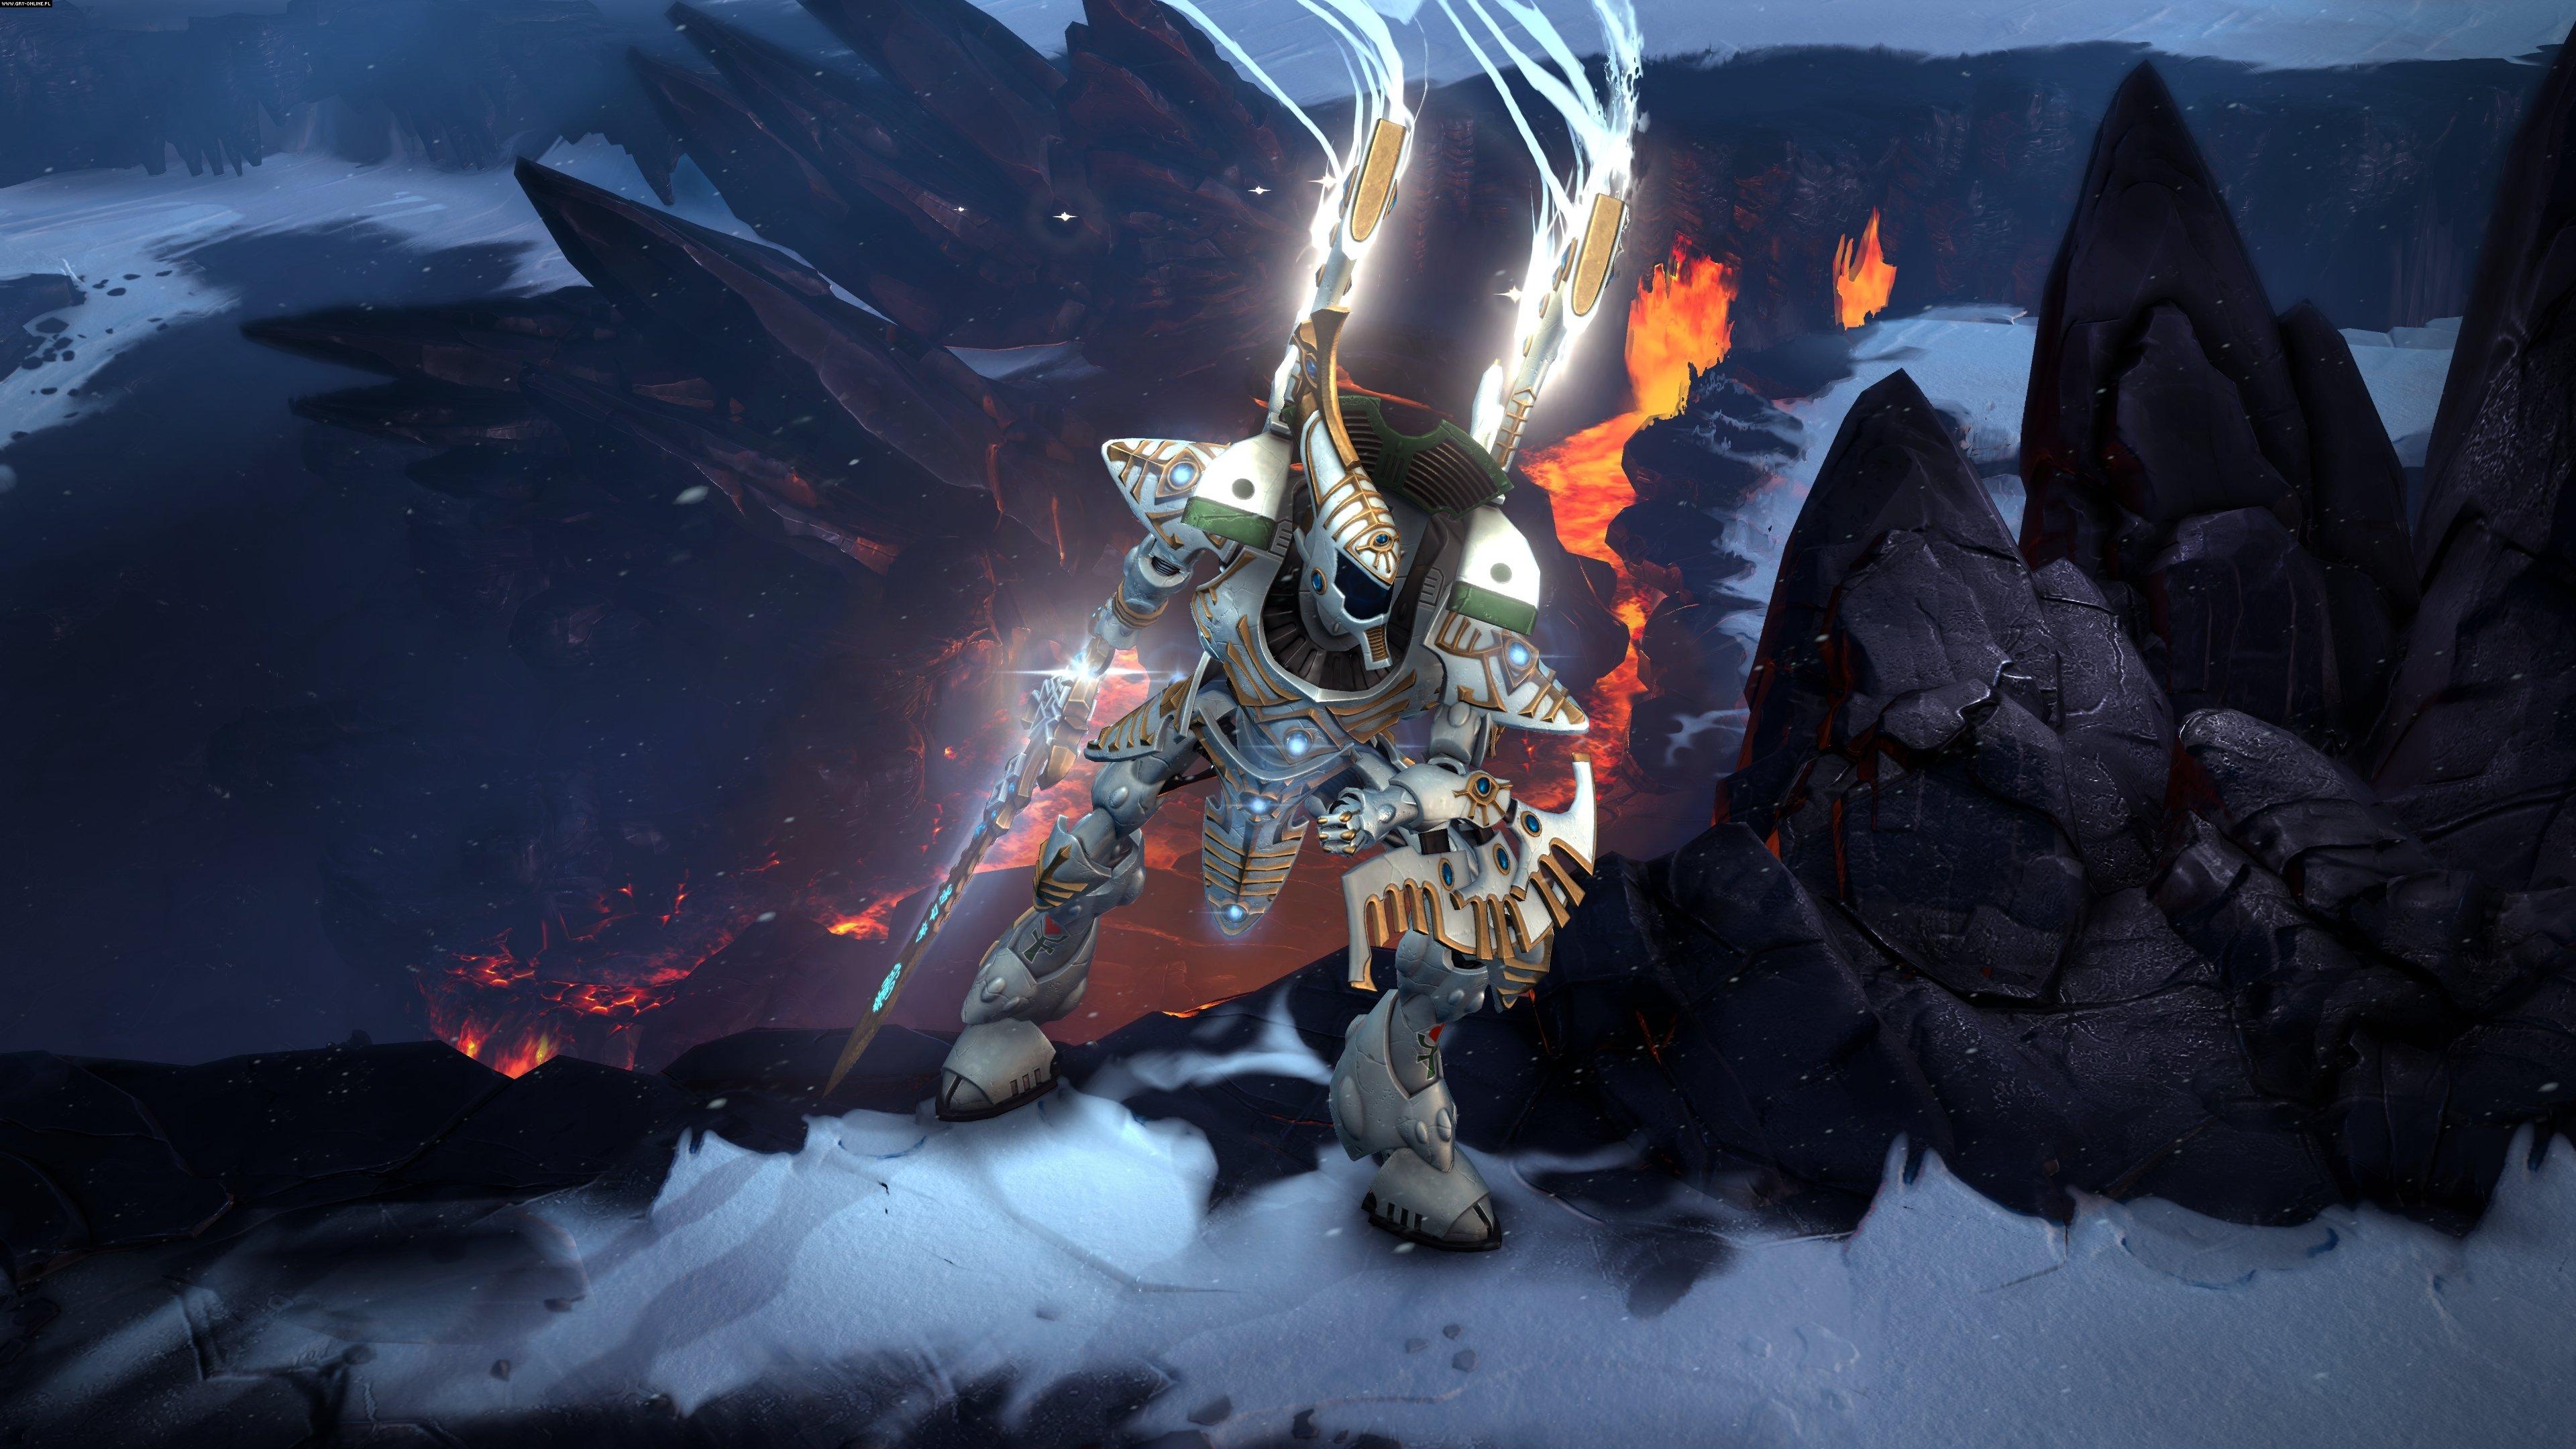 Warhammer 40,000: Dawn of War III PC Games Image 2/32, Relic Entertainment, SEGA